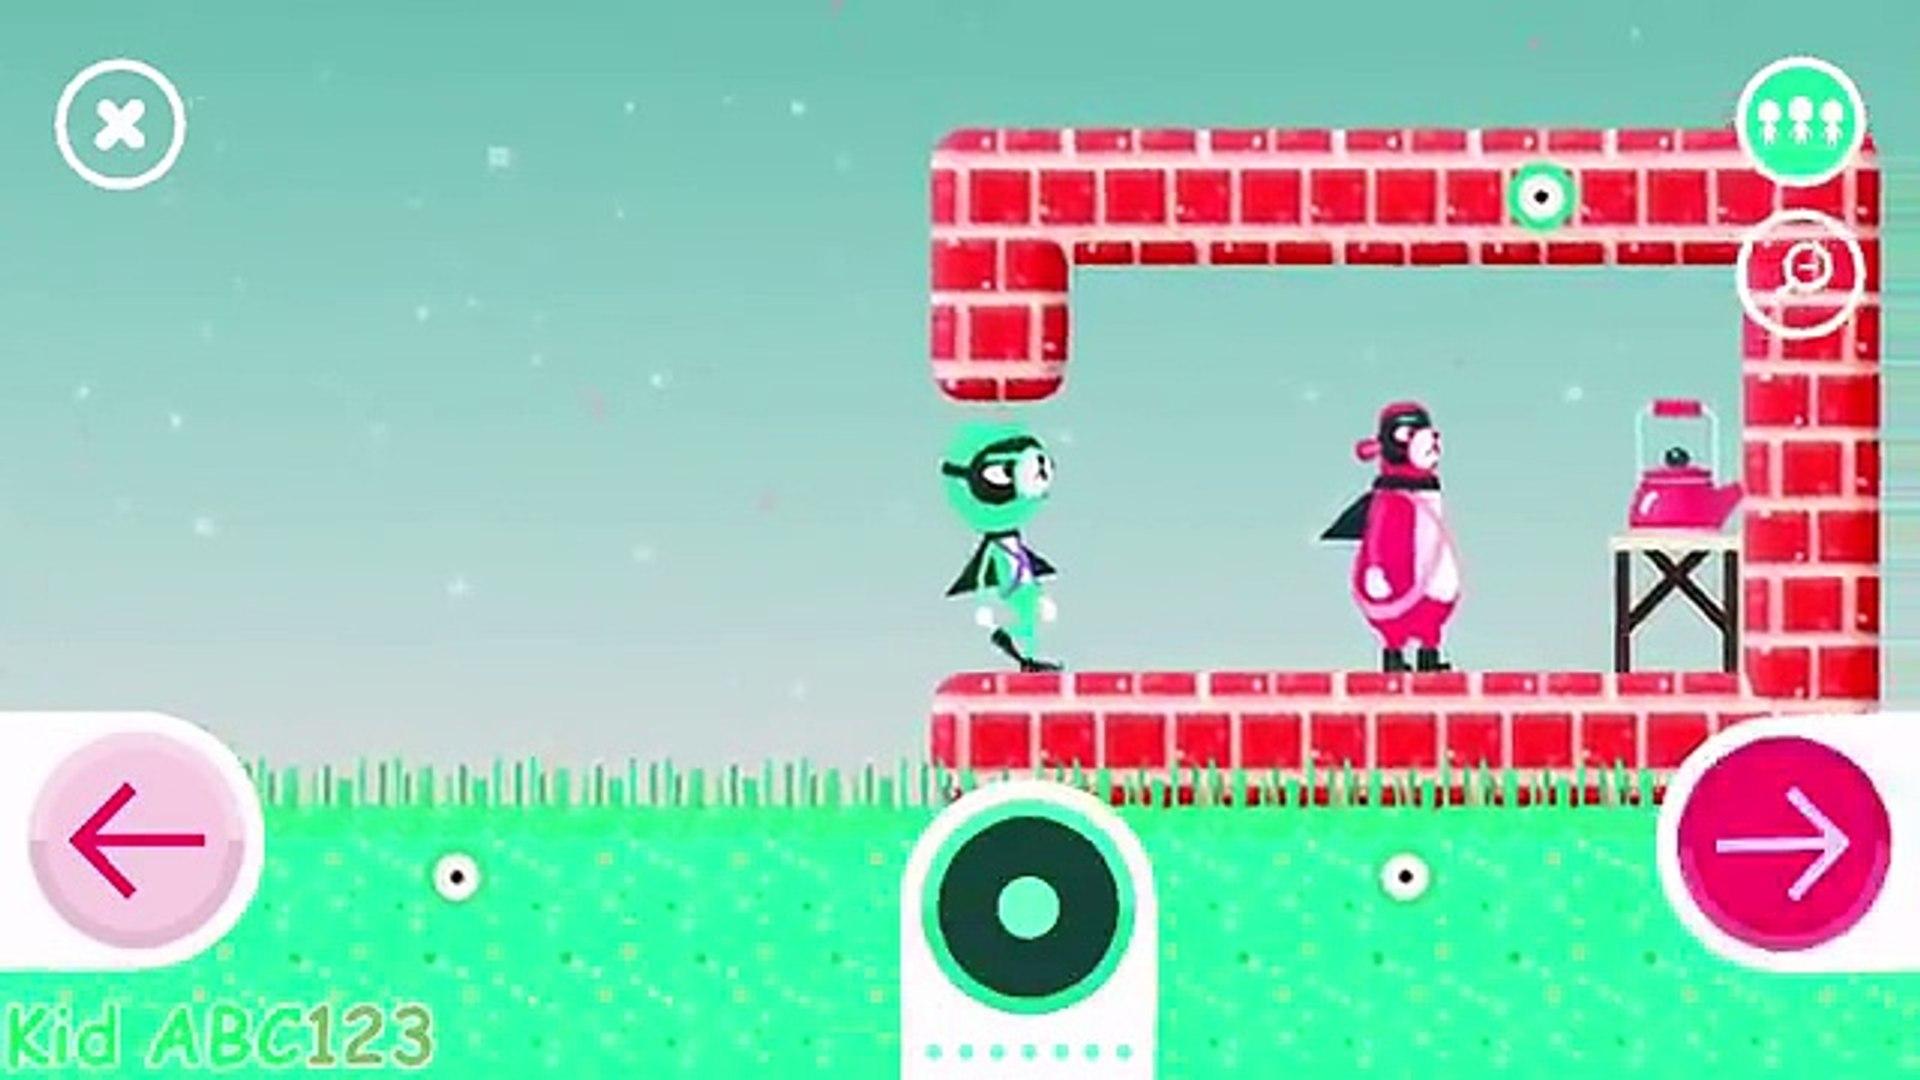 Toca Blocks Game (Toca Boca) Part 4 - Education Apps for Kids